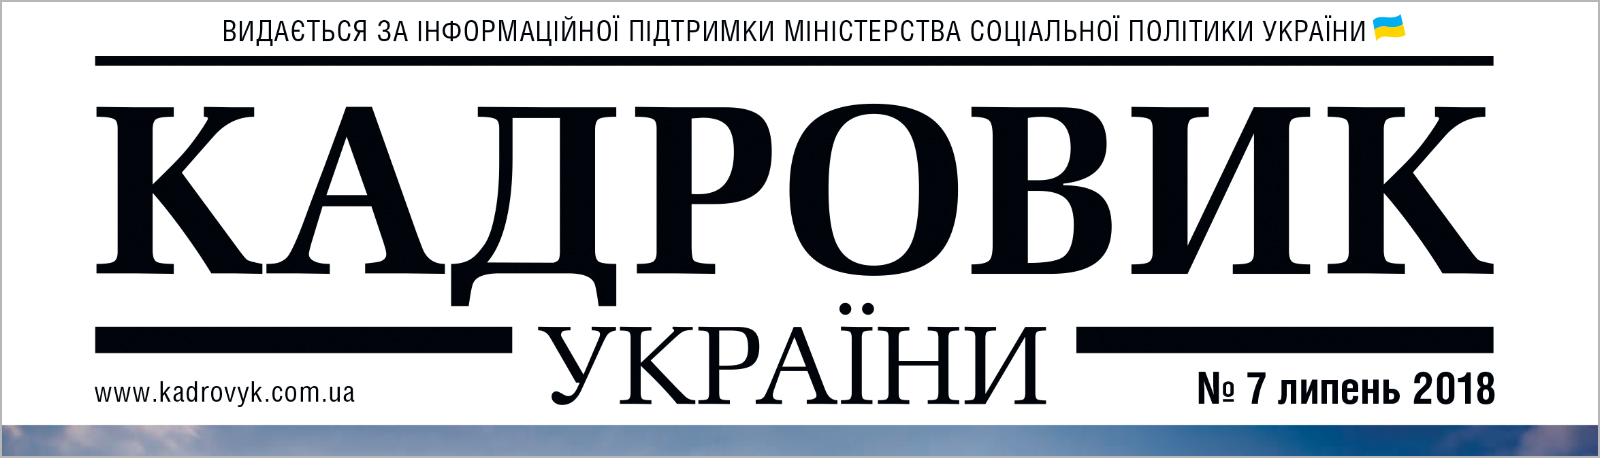 Анонс журналу «Кадровик України» № 7/2018